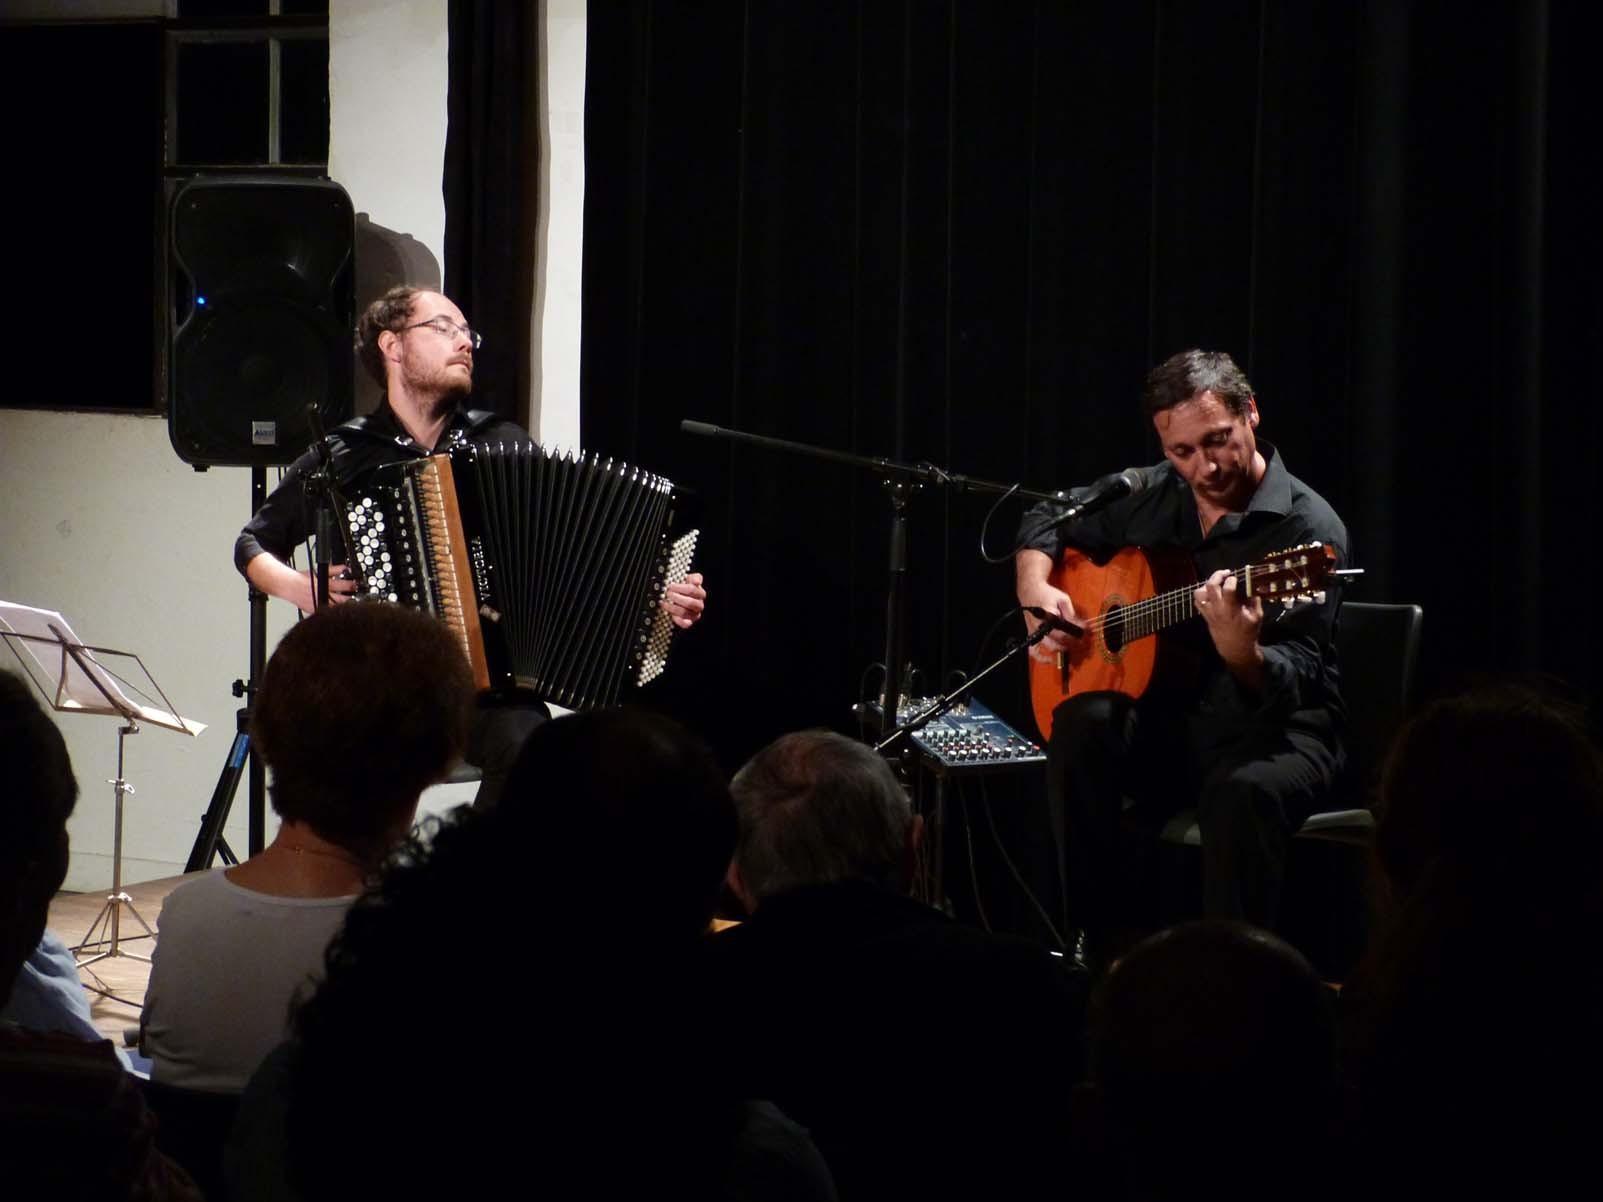 Kiko Ruiz, guitare flamenca / Grégory Daltin, accordéon